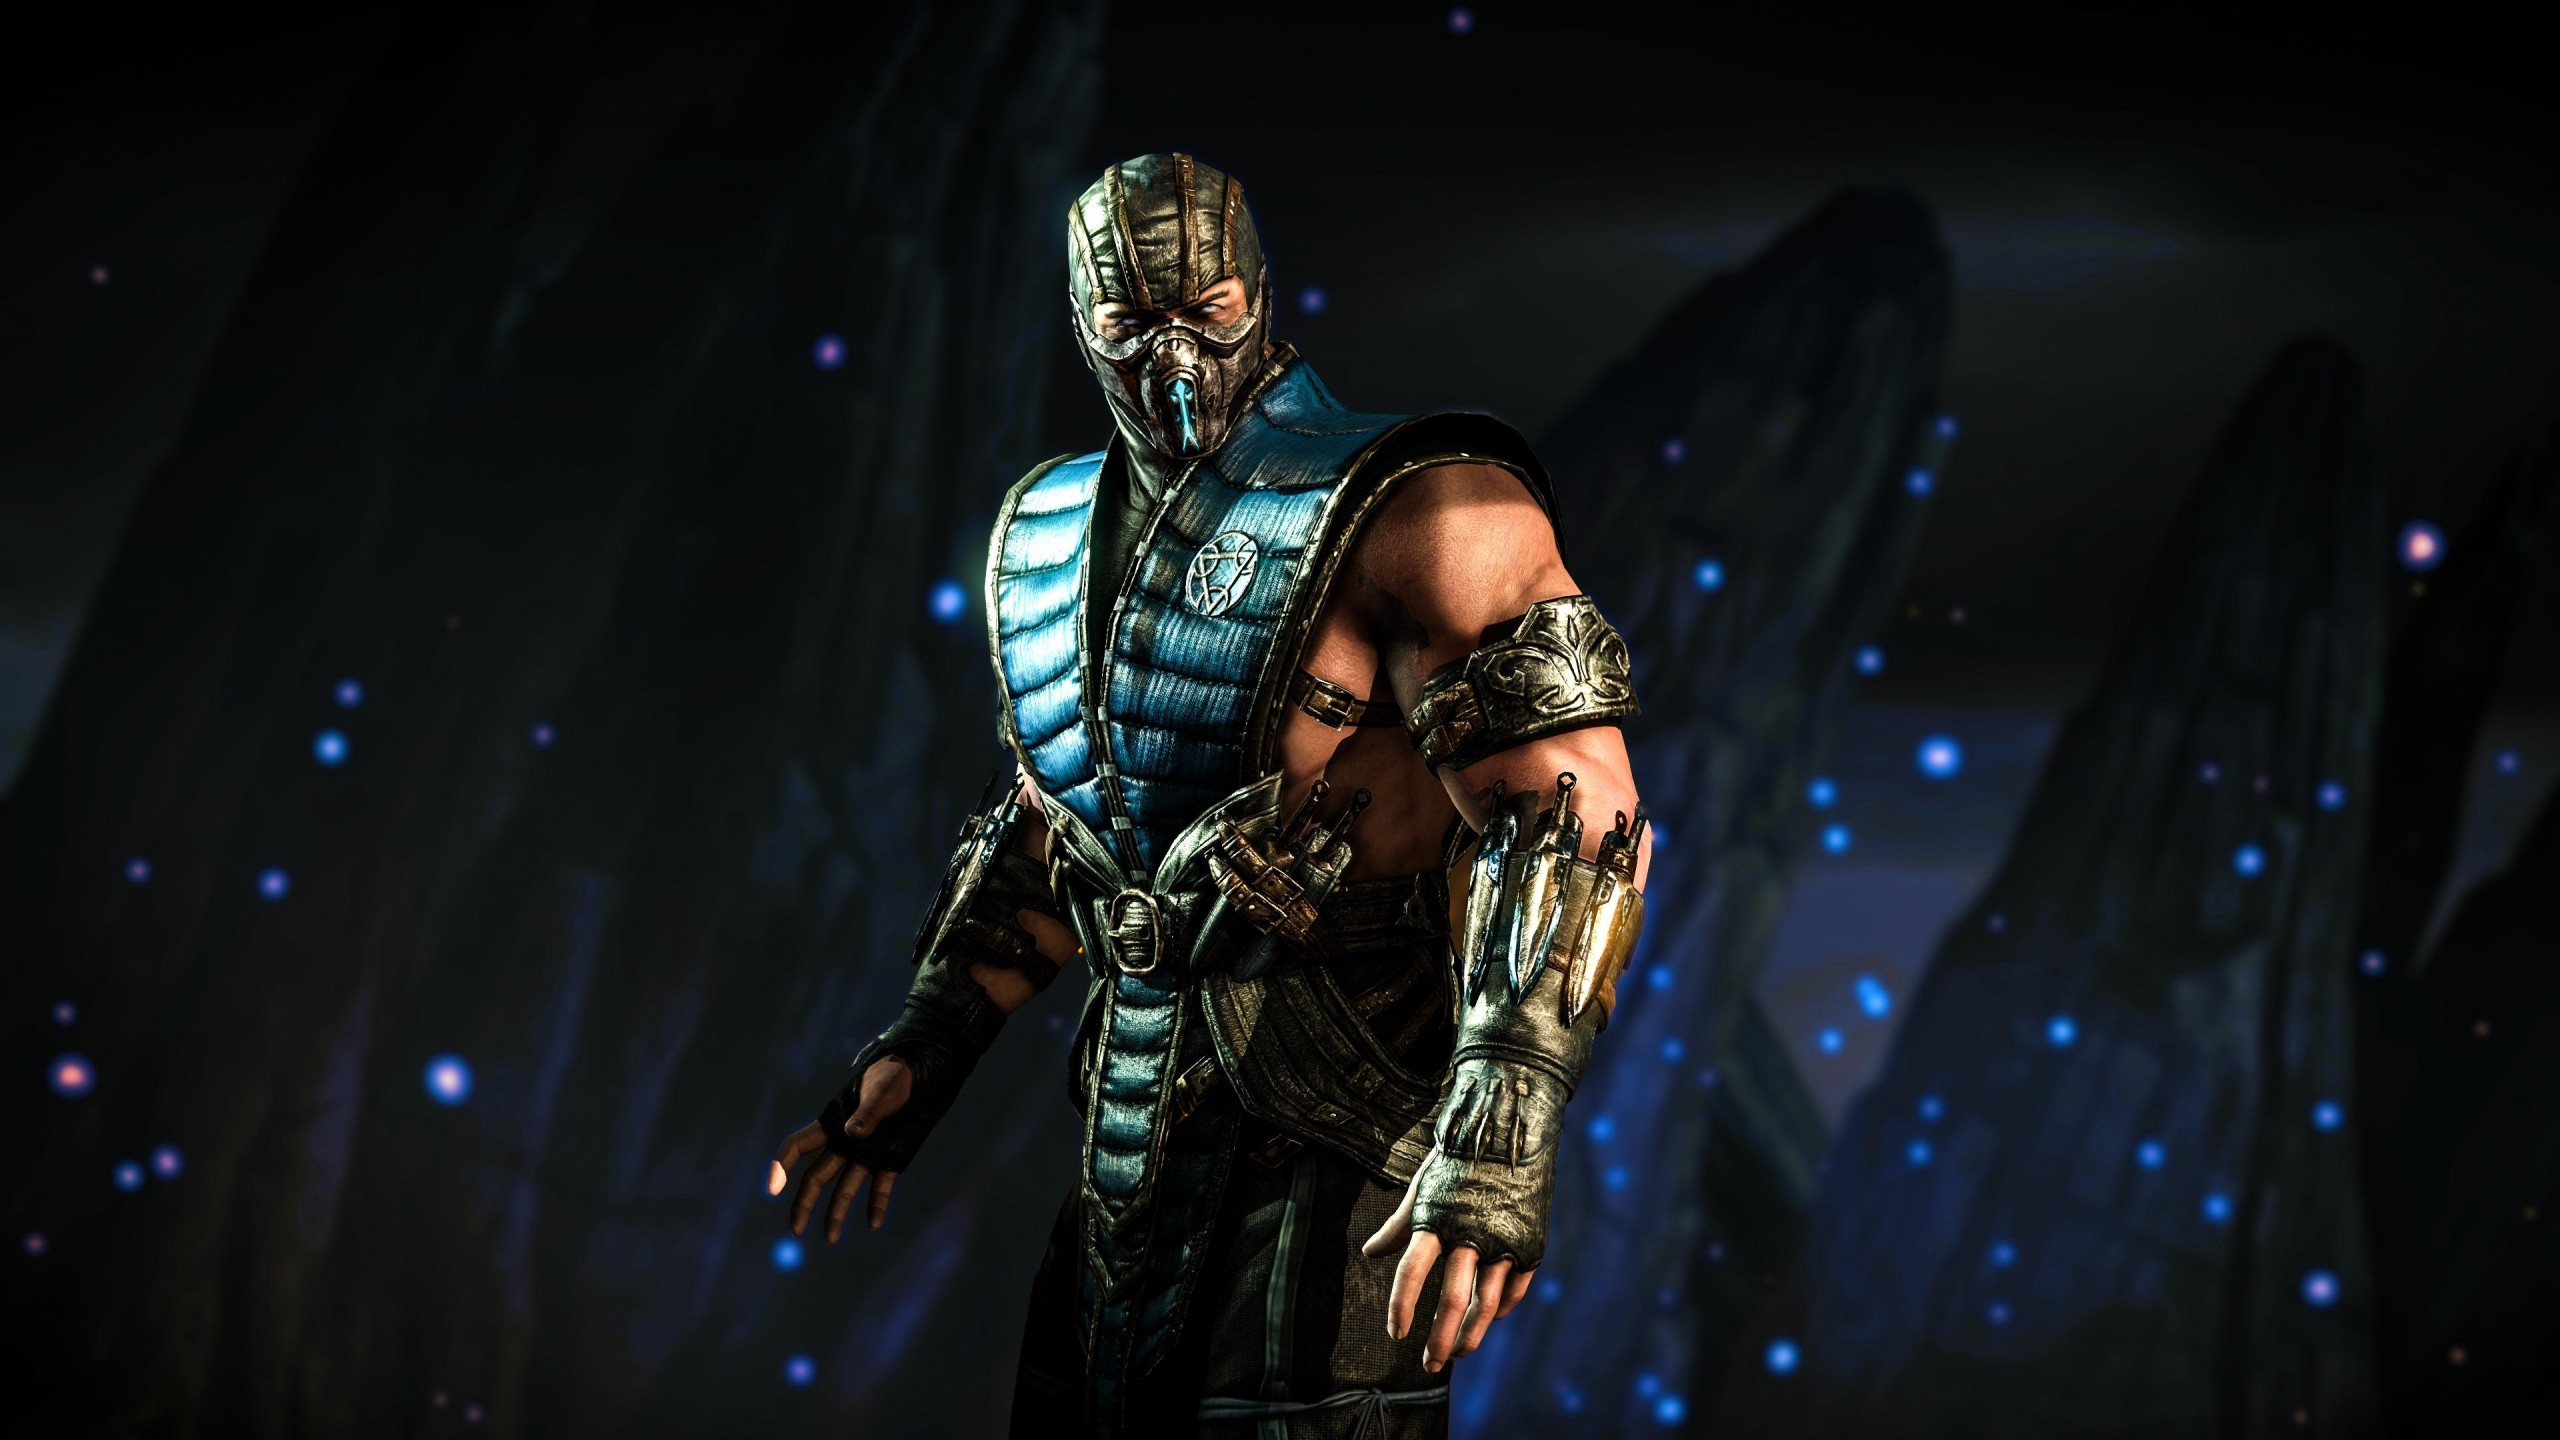 Wallpaper Mortal Kombat X Sub Zero Fighting Ps4 Xbox One